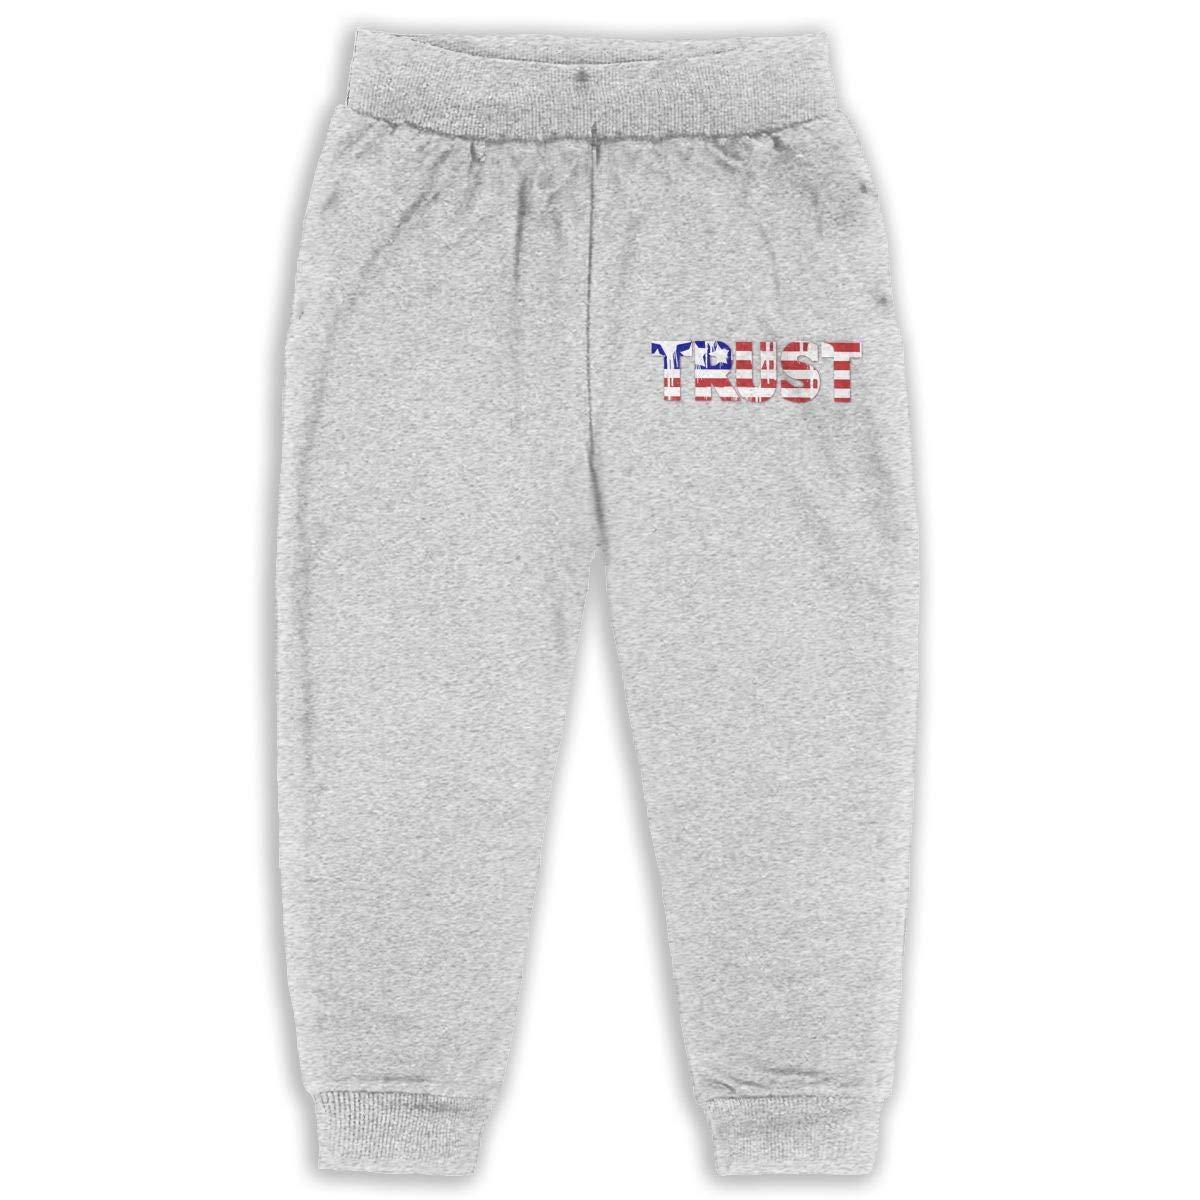 Fleece Active Joggers Elastic Pants DaXi1 USA Trust Sweatpants for Boys /& Girls